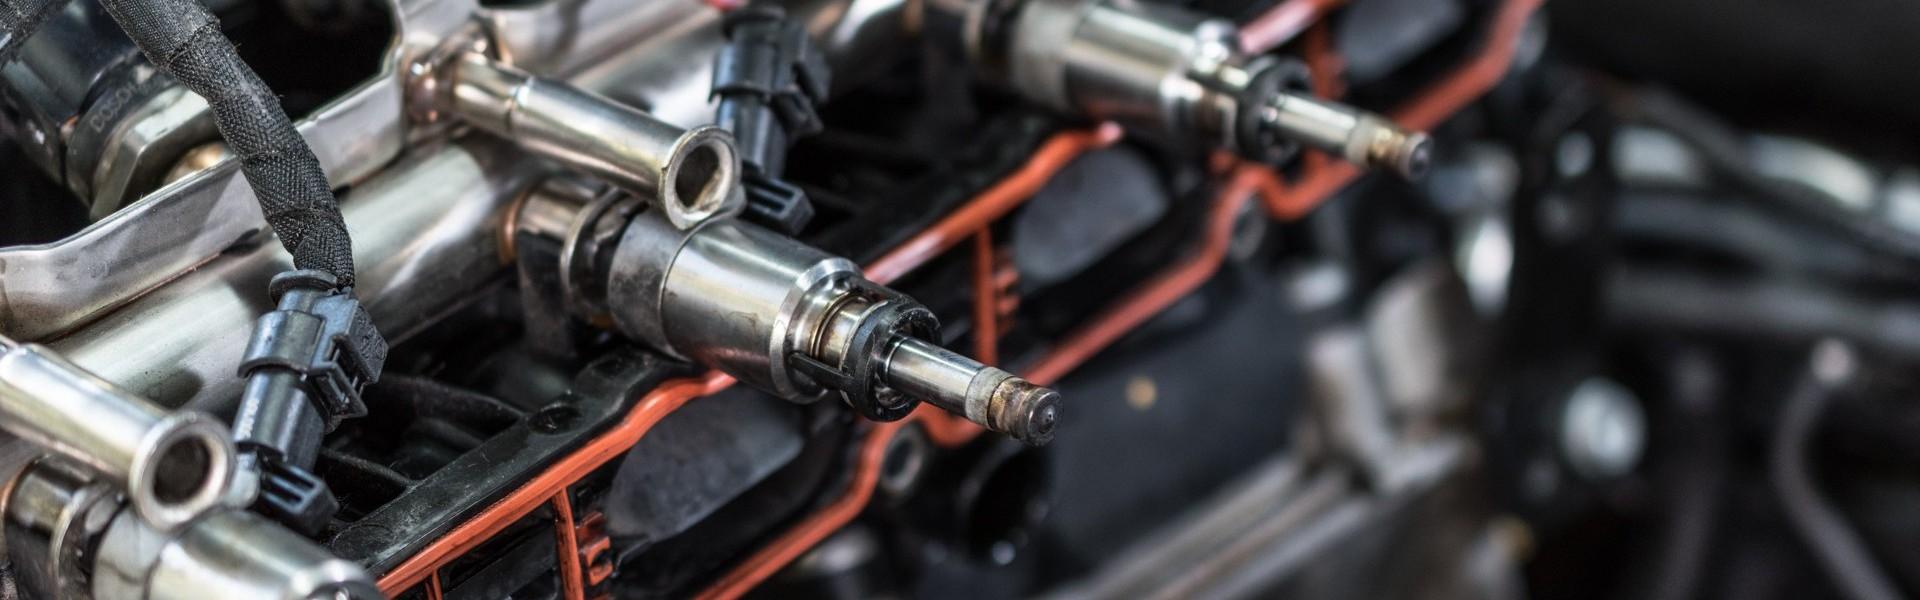 Dekarbonizácia motora